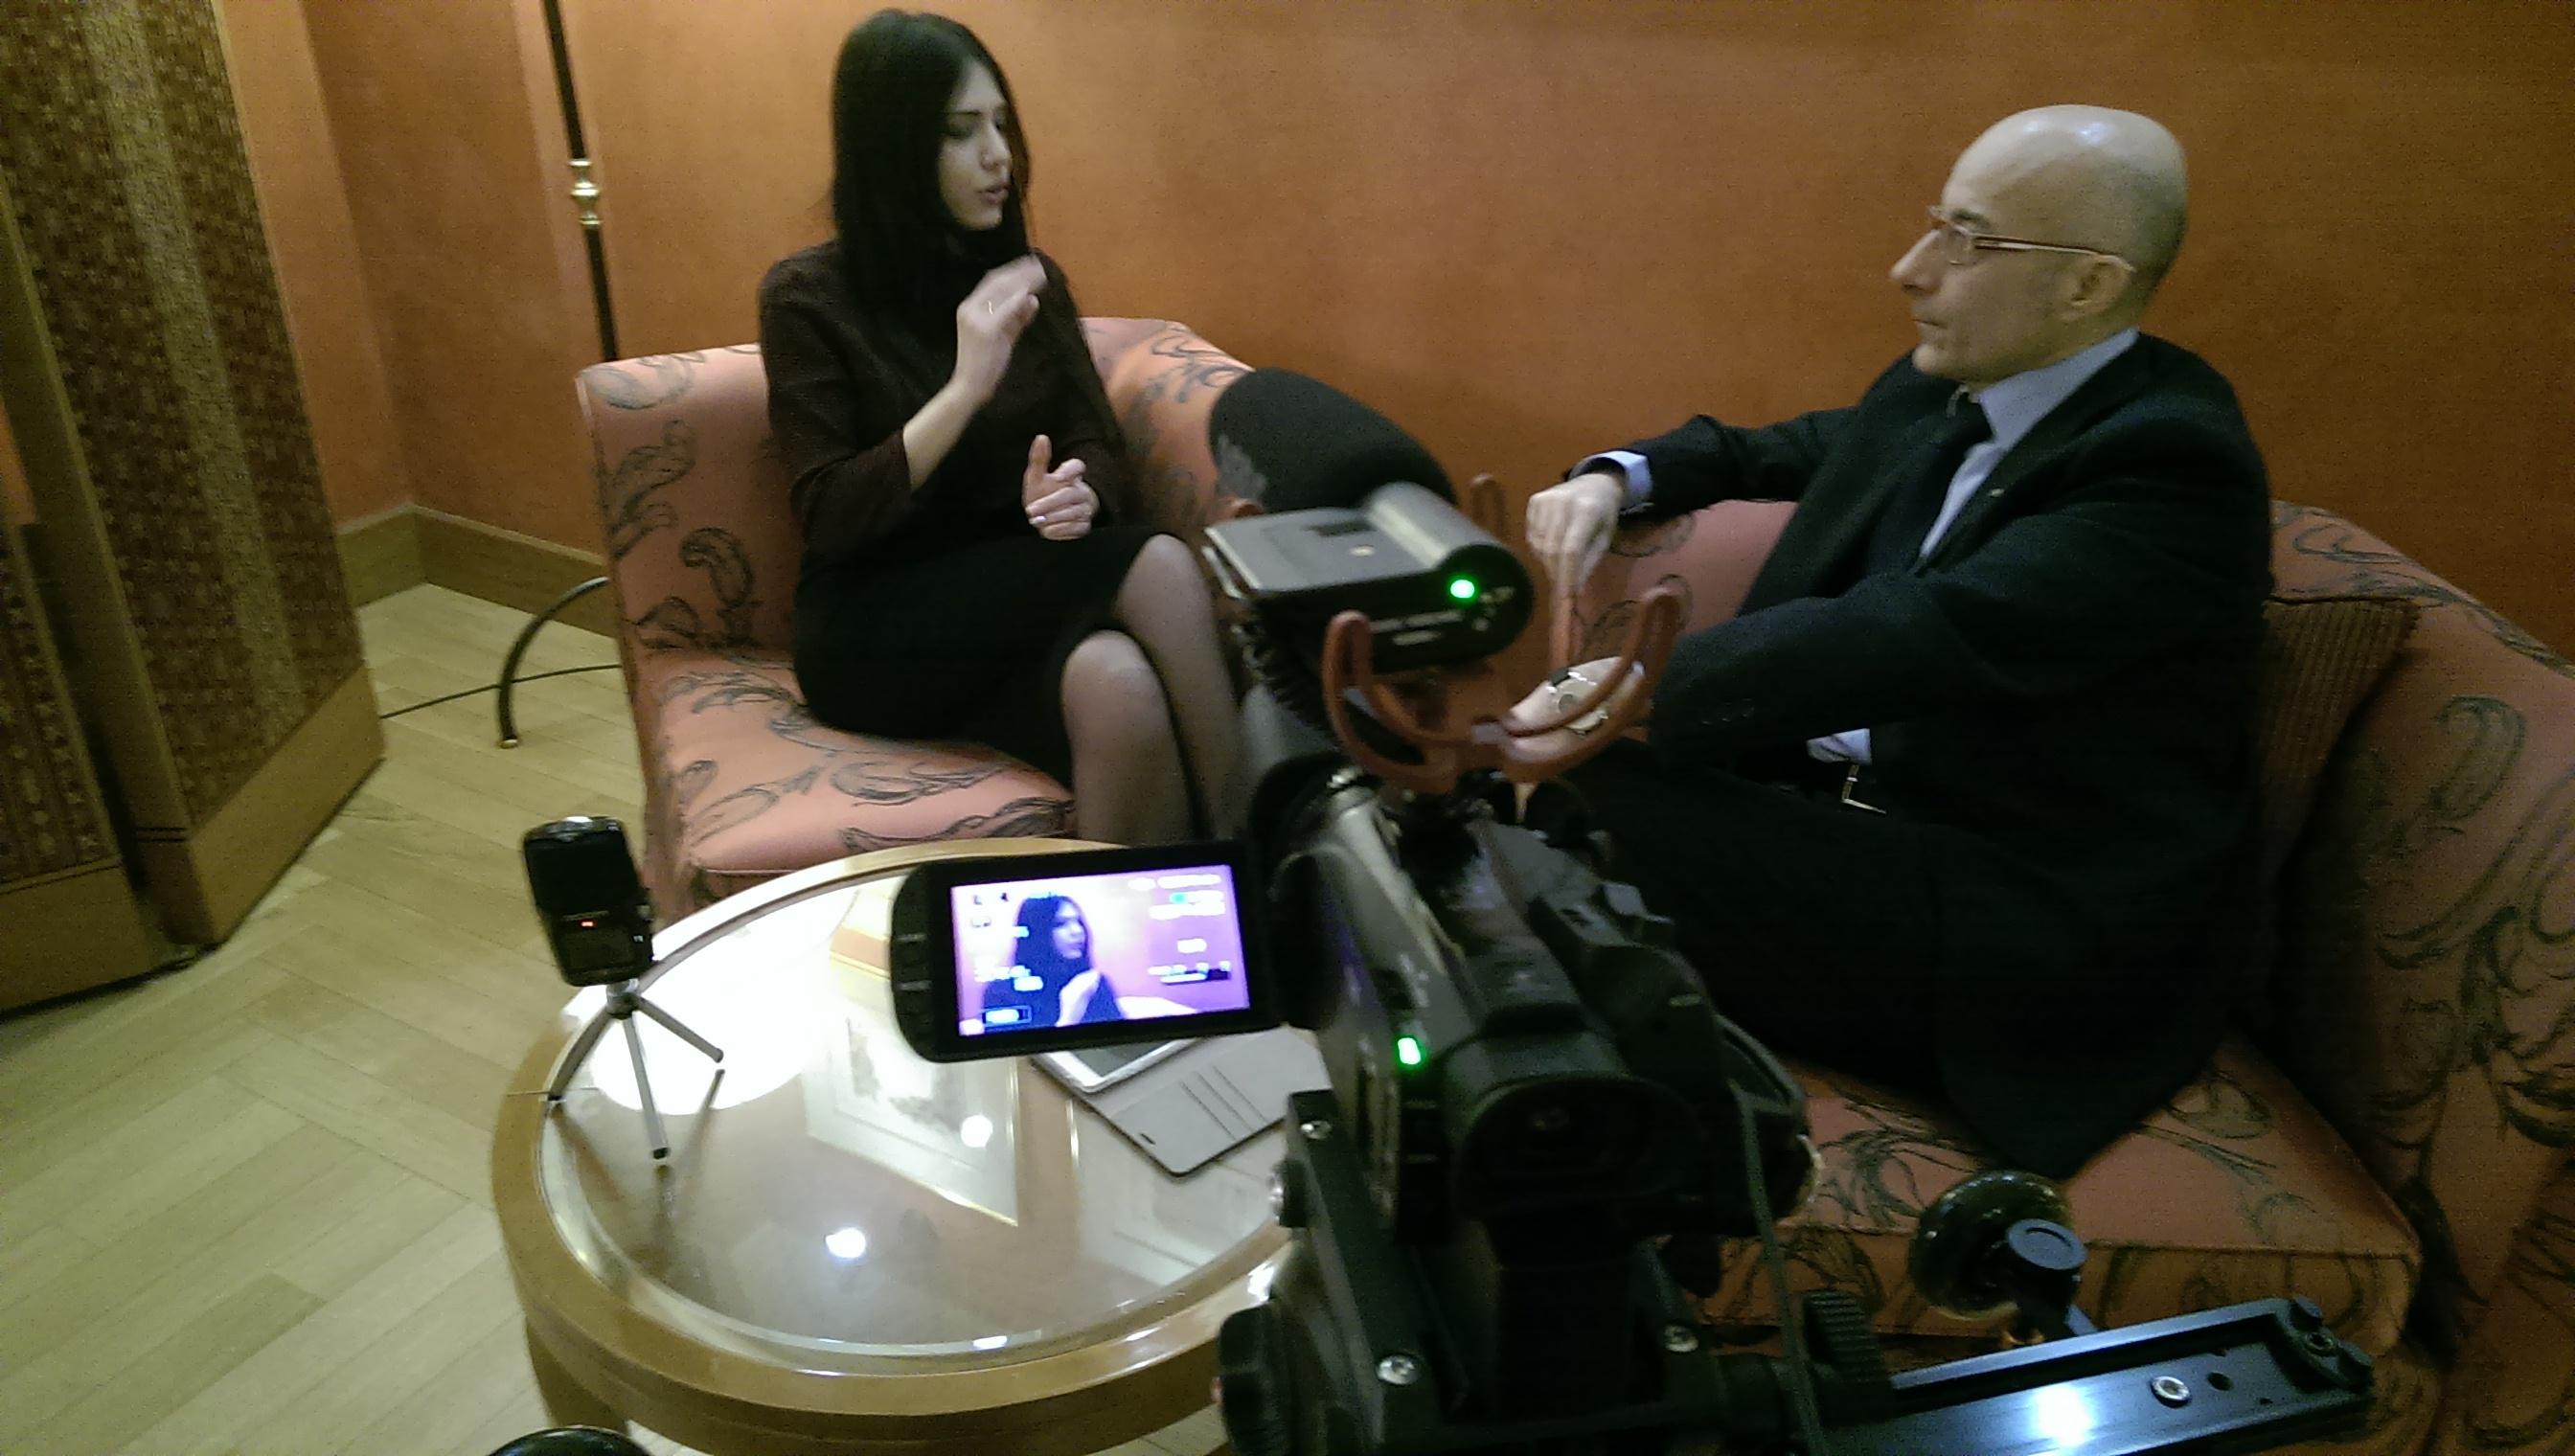 Intervista a Clarissa Marchese, miss Italia 2014